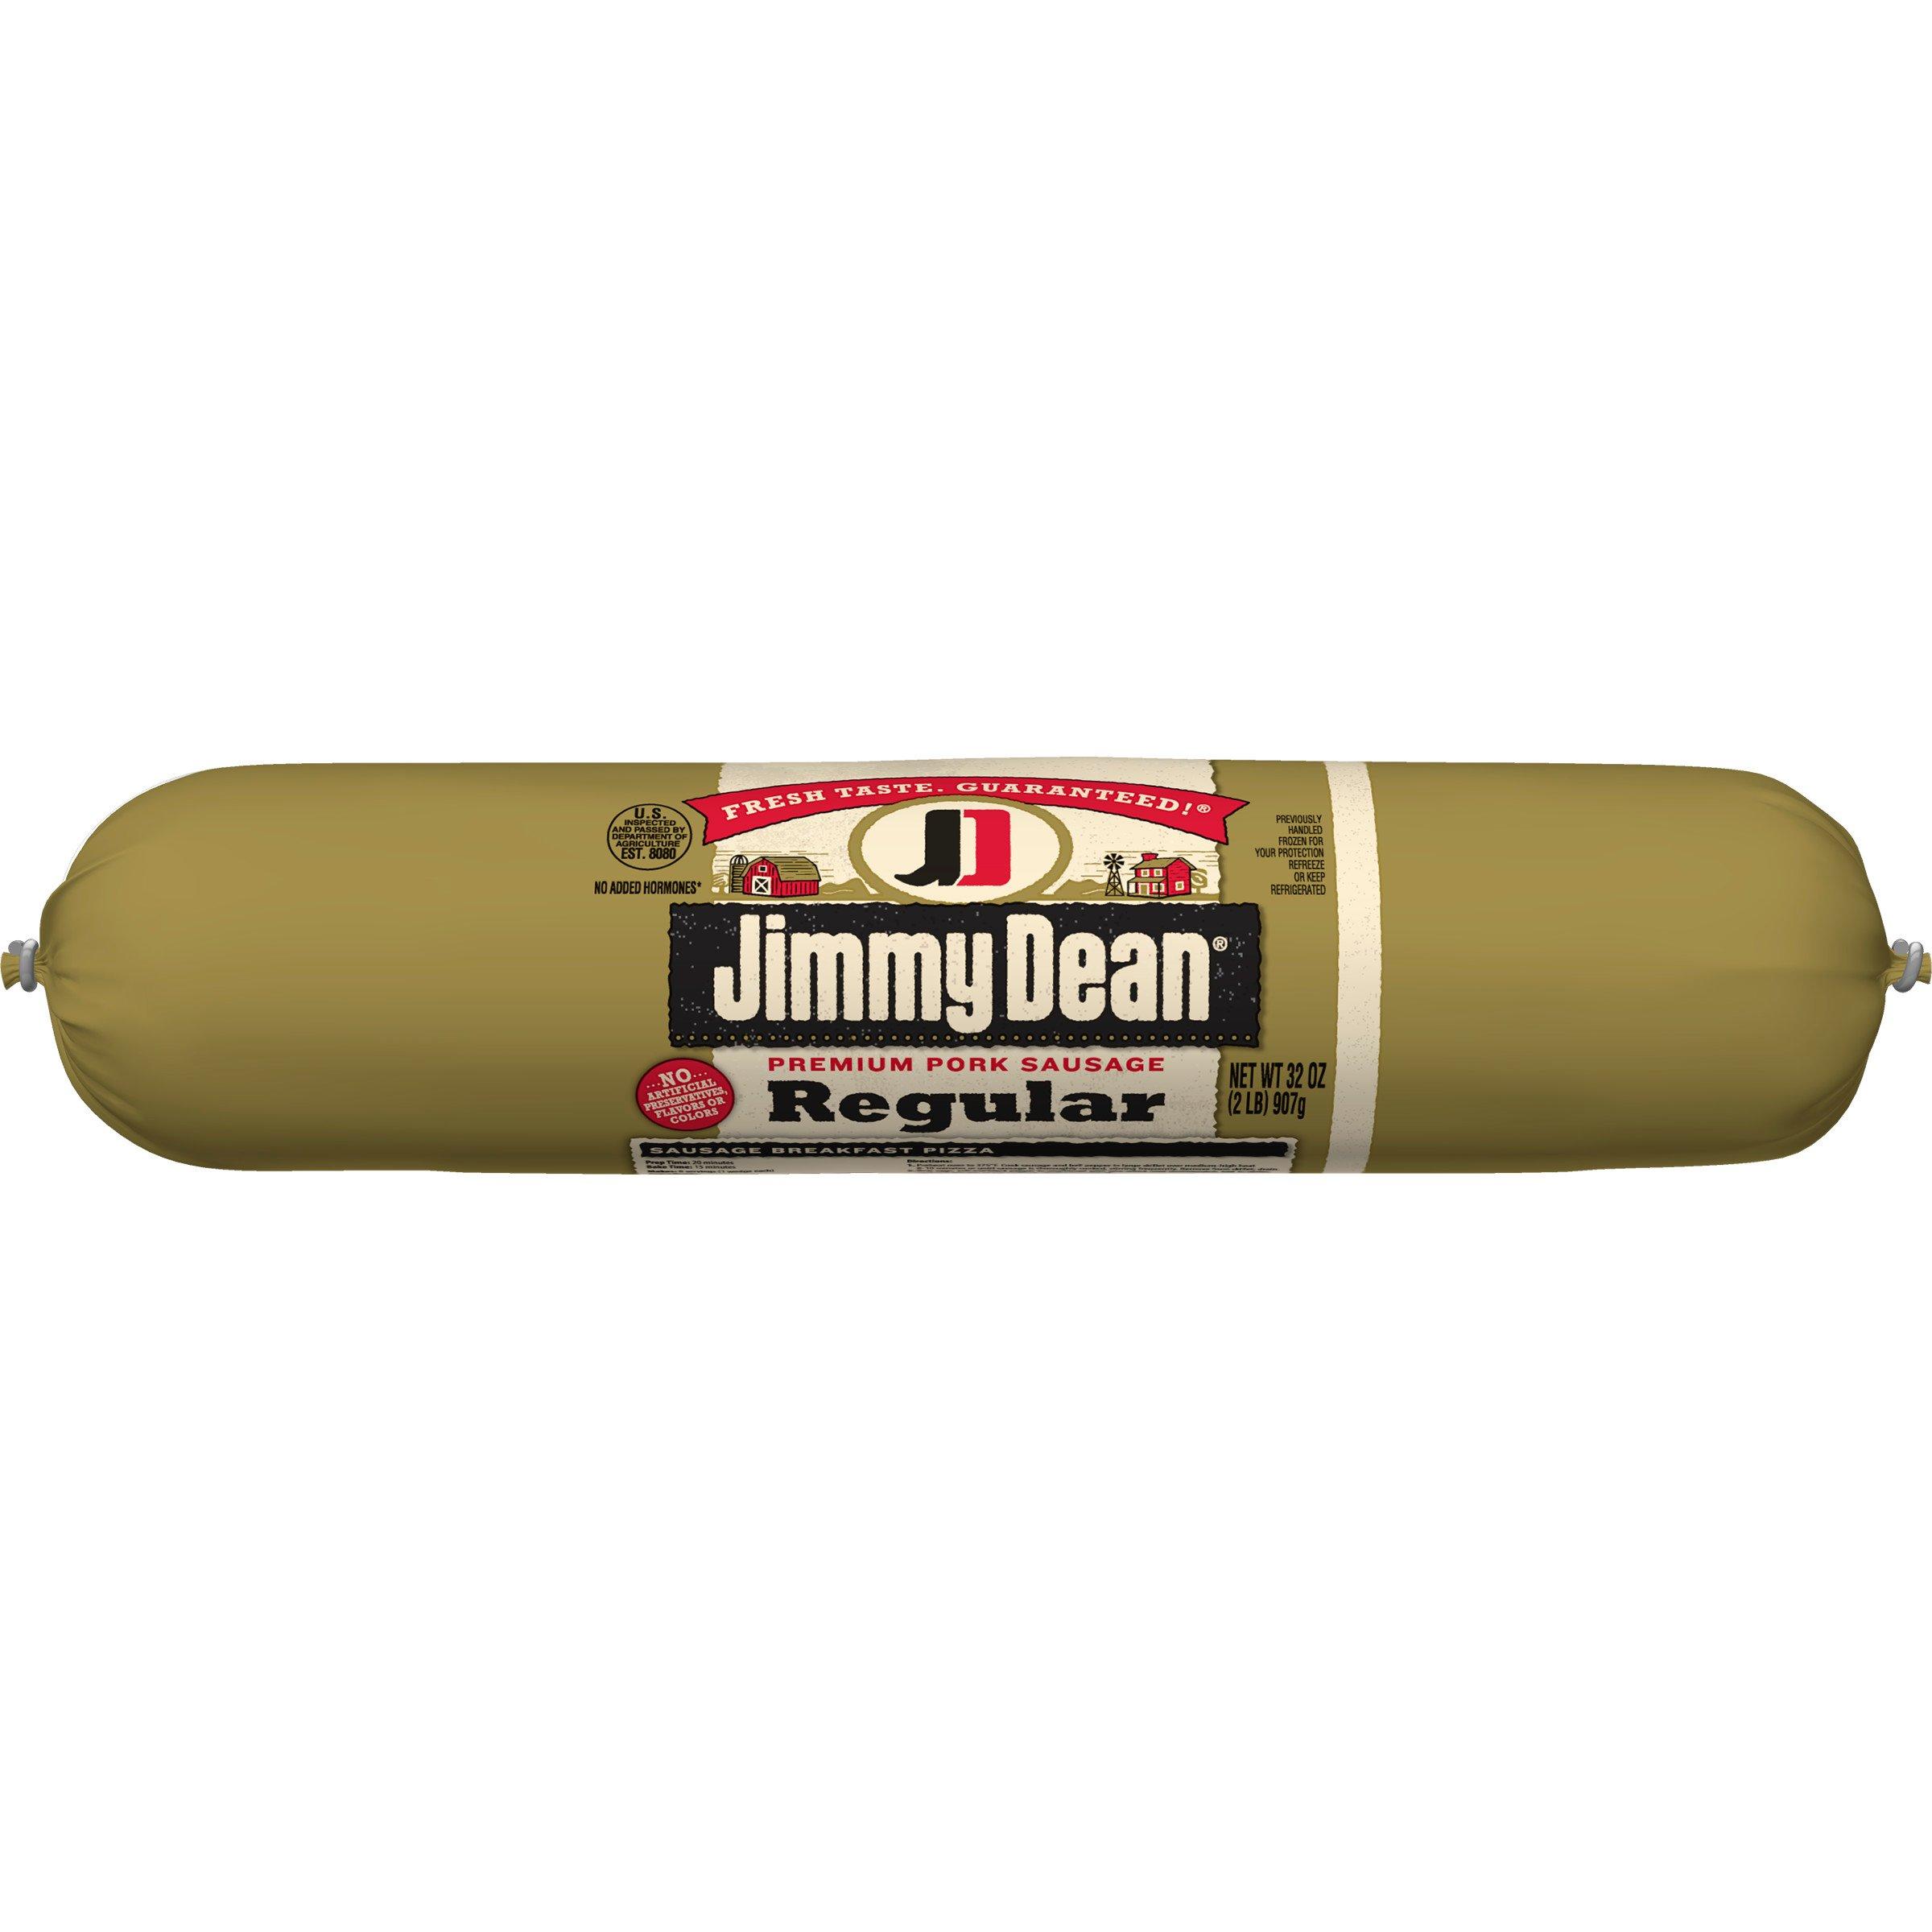 Jimmy Dean Premium Regular Pork Sausage - Shop Breakfast Sausage at HEB